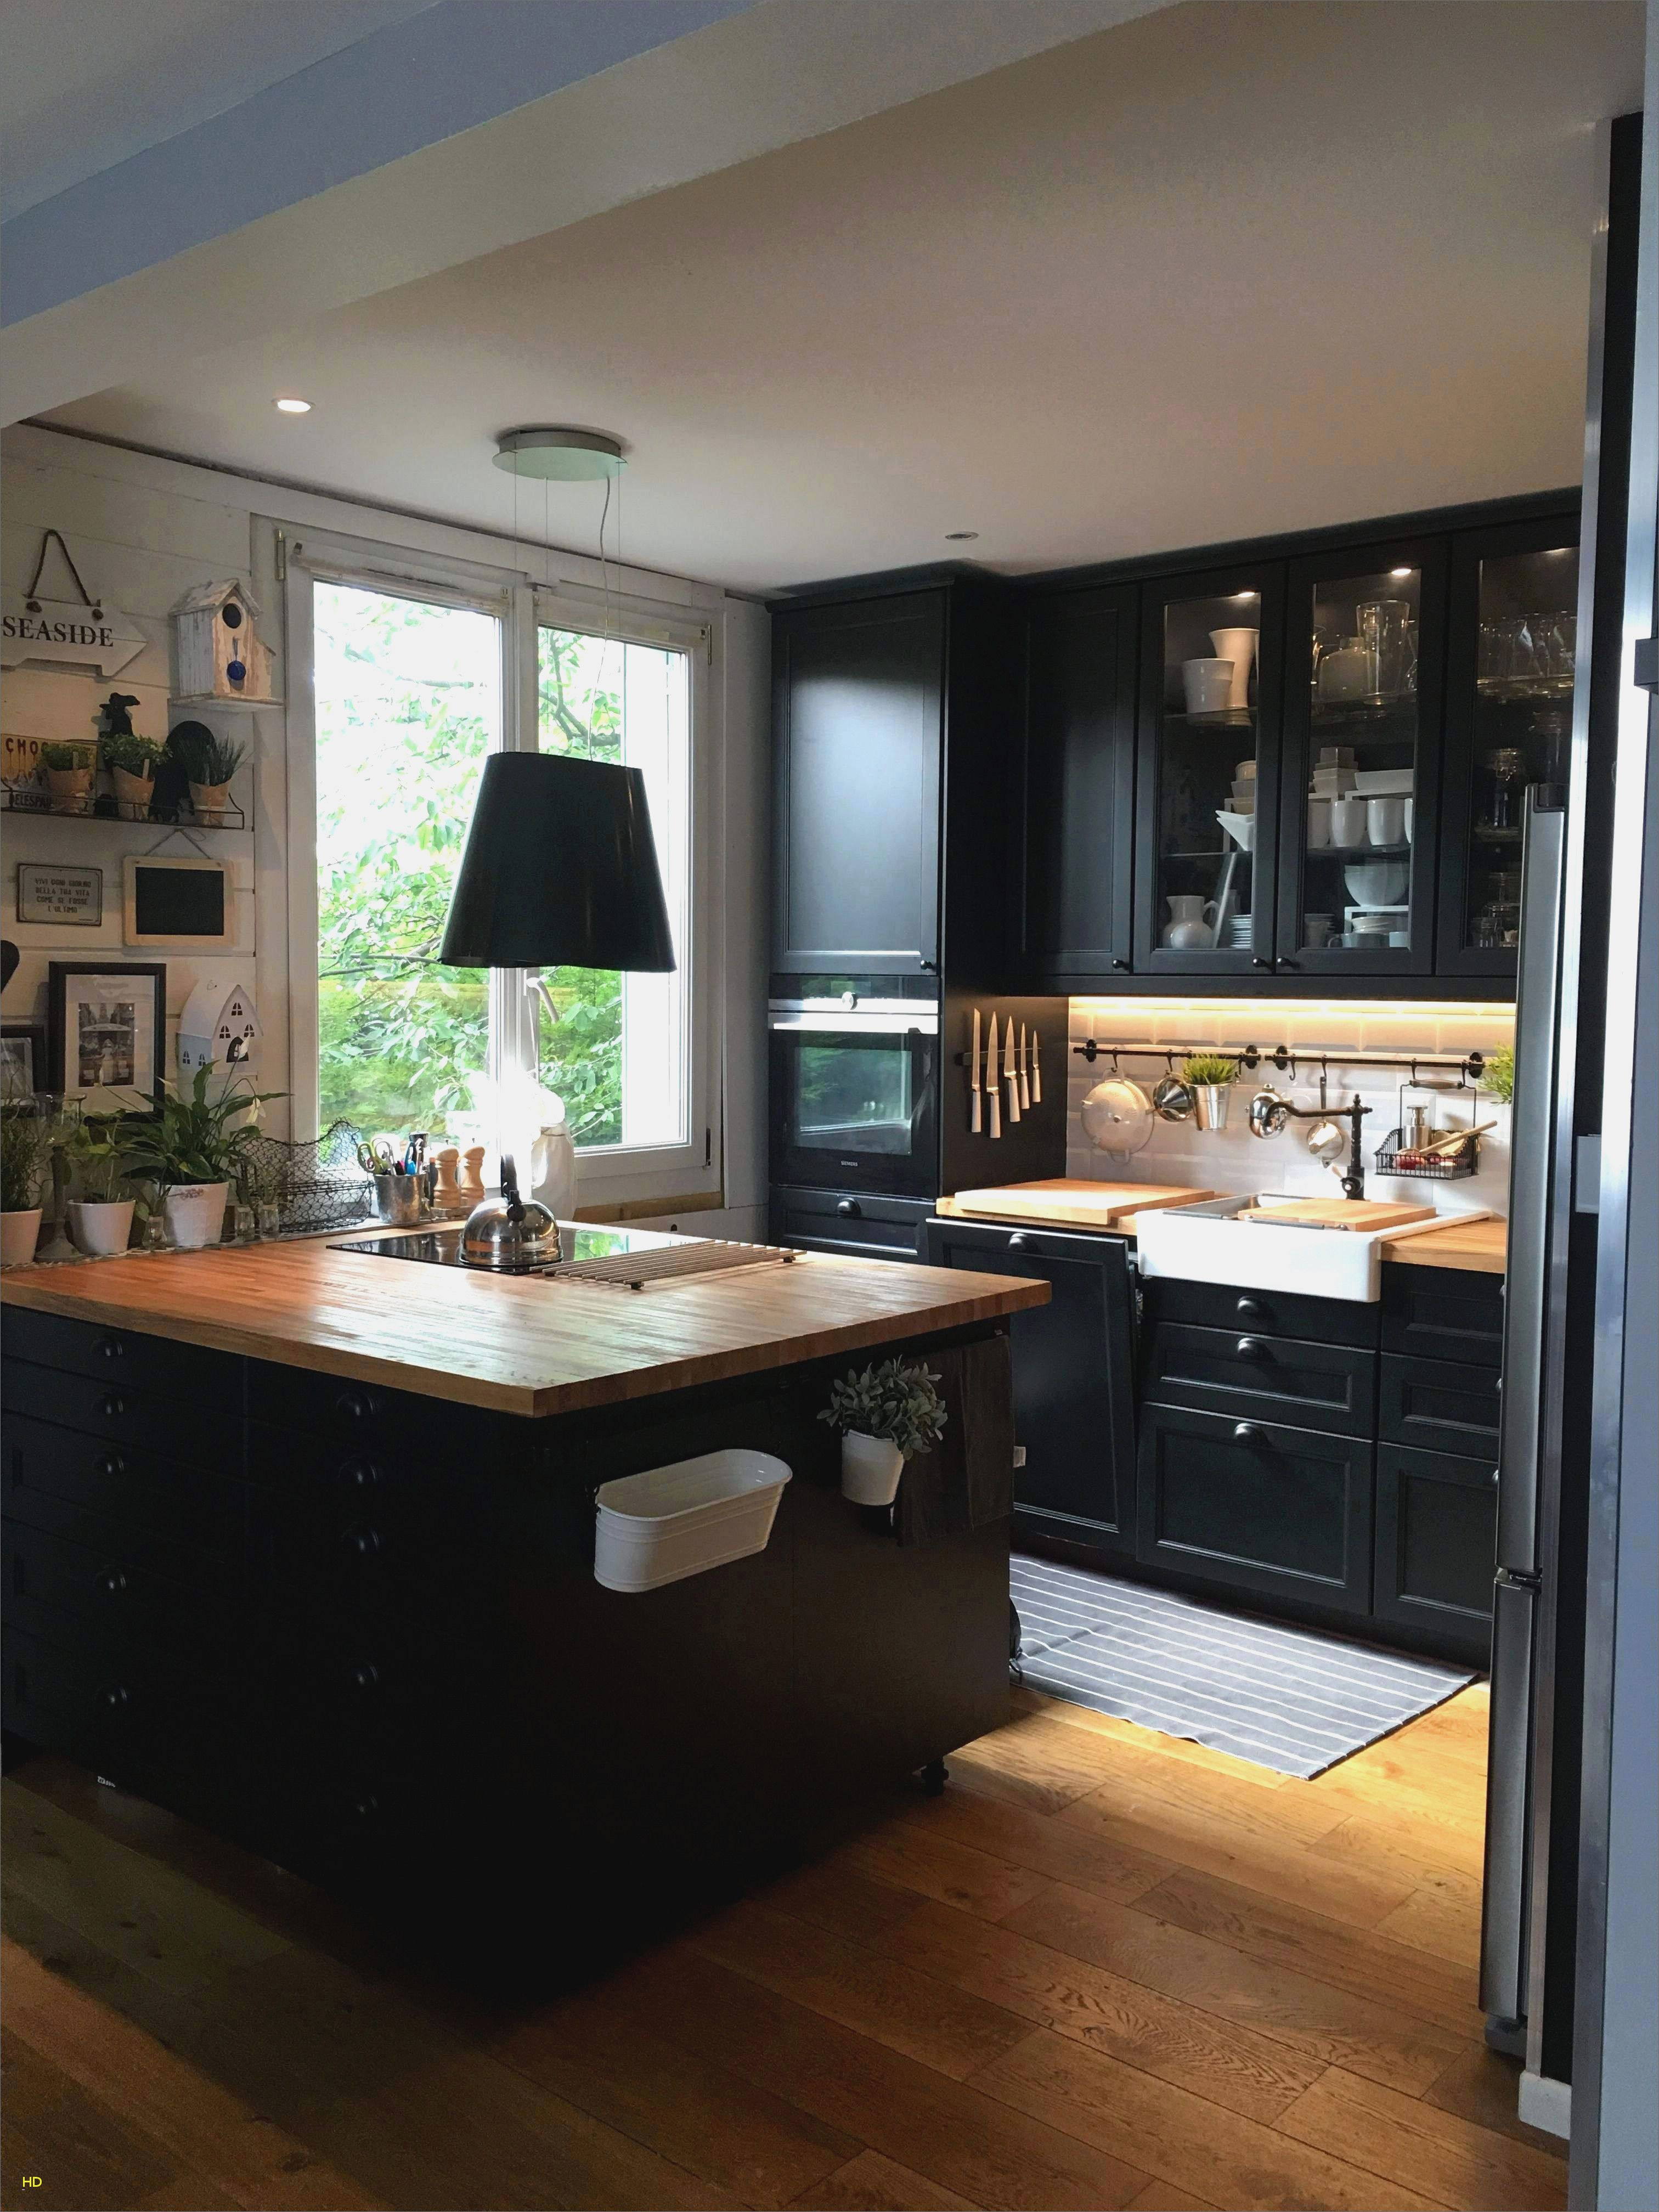 Luxury Modele Cuisine Ilot Central Interior Design Kitchen Kitchen Remodel Home Kitchens